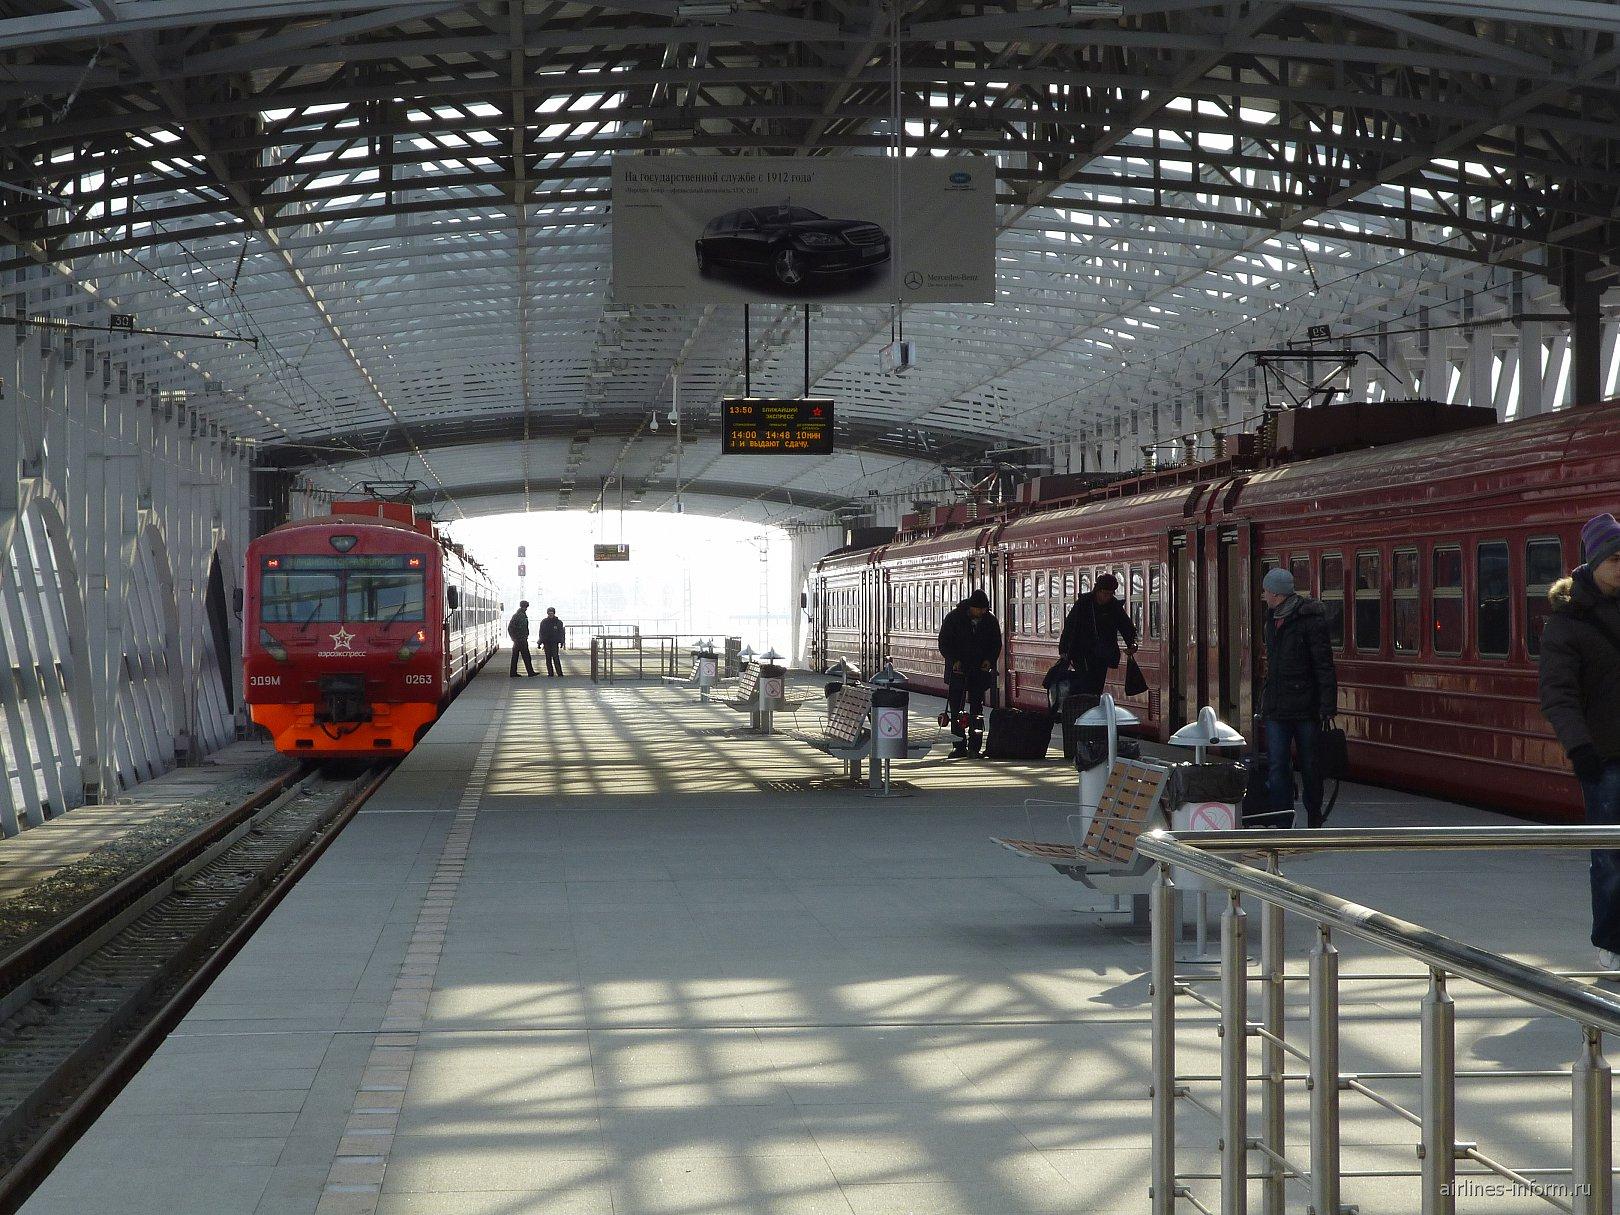 Станция аэроэкспресса в аэропорту Владивостока